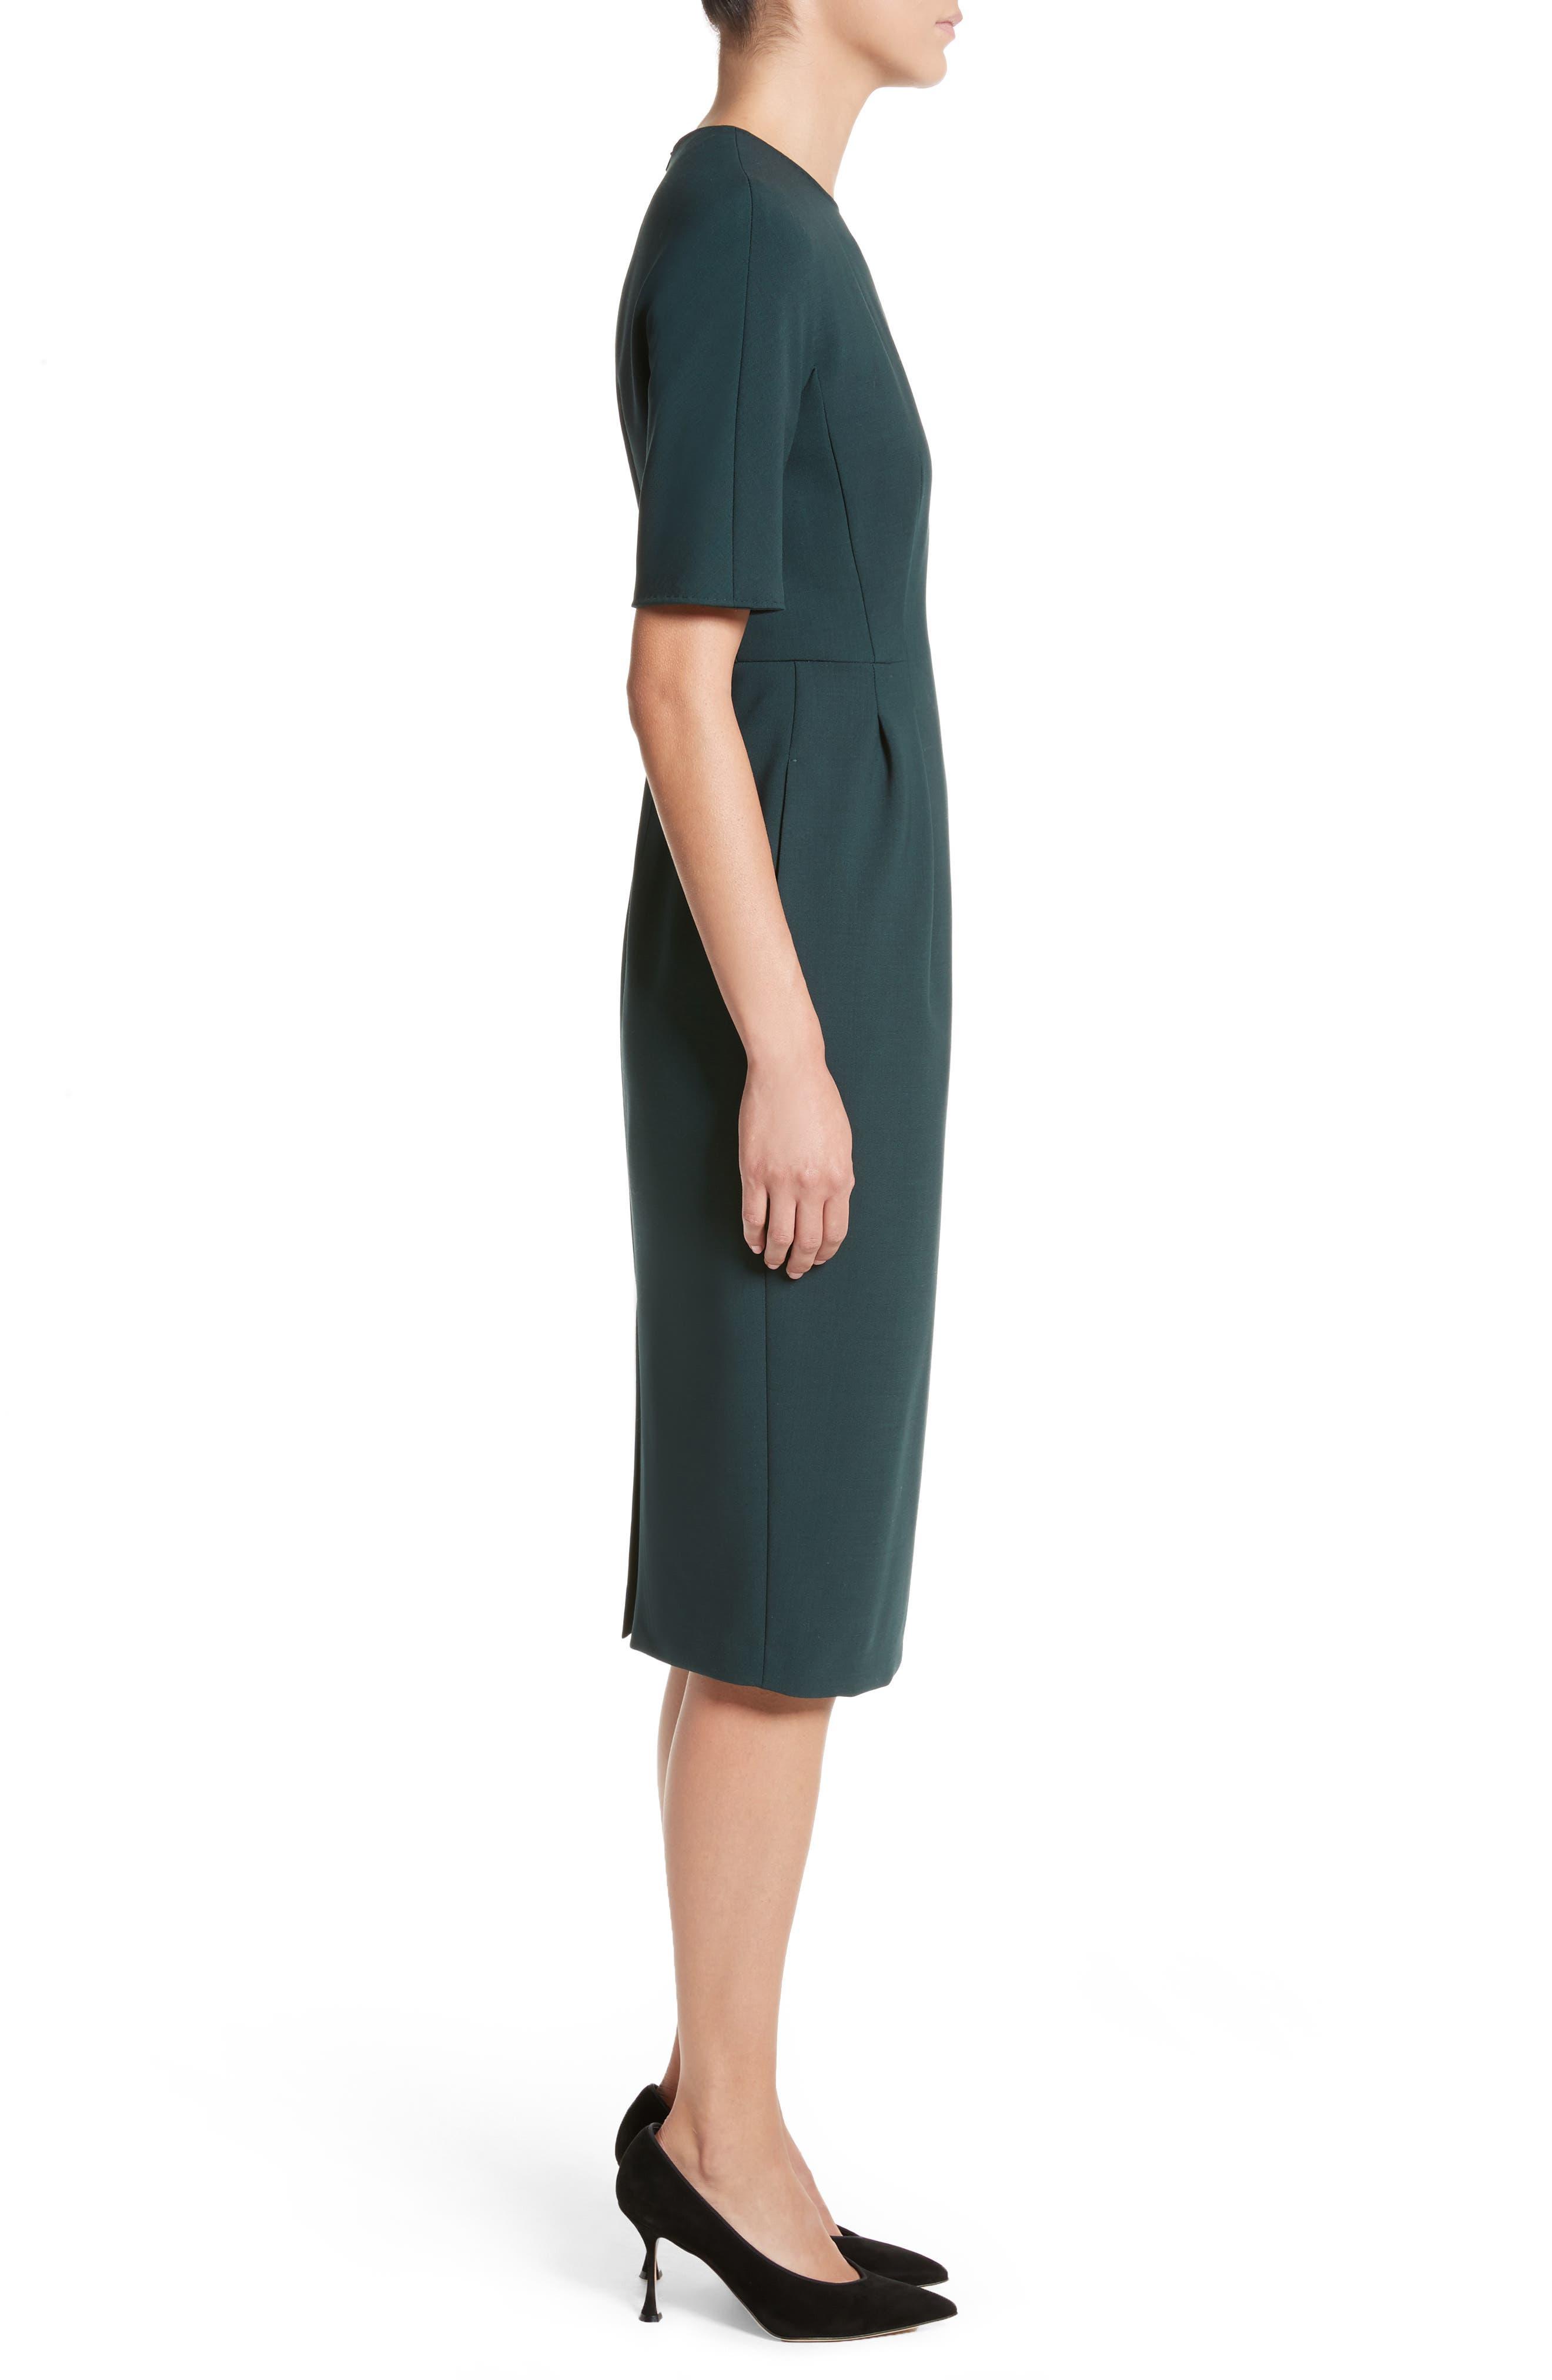 Umano Stretch Wool Sheath Dress,                             Alternate thumbnail 3, color,                             304